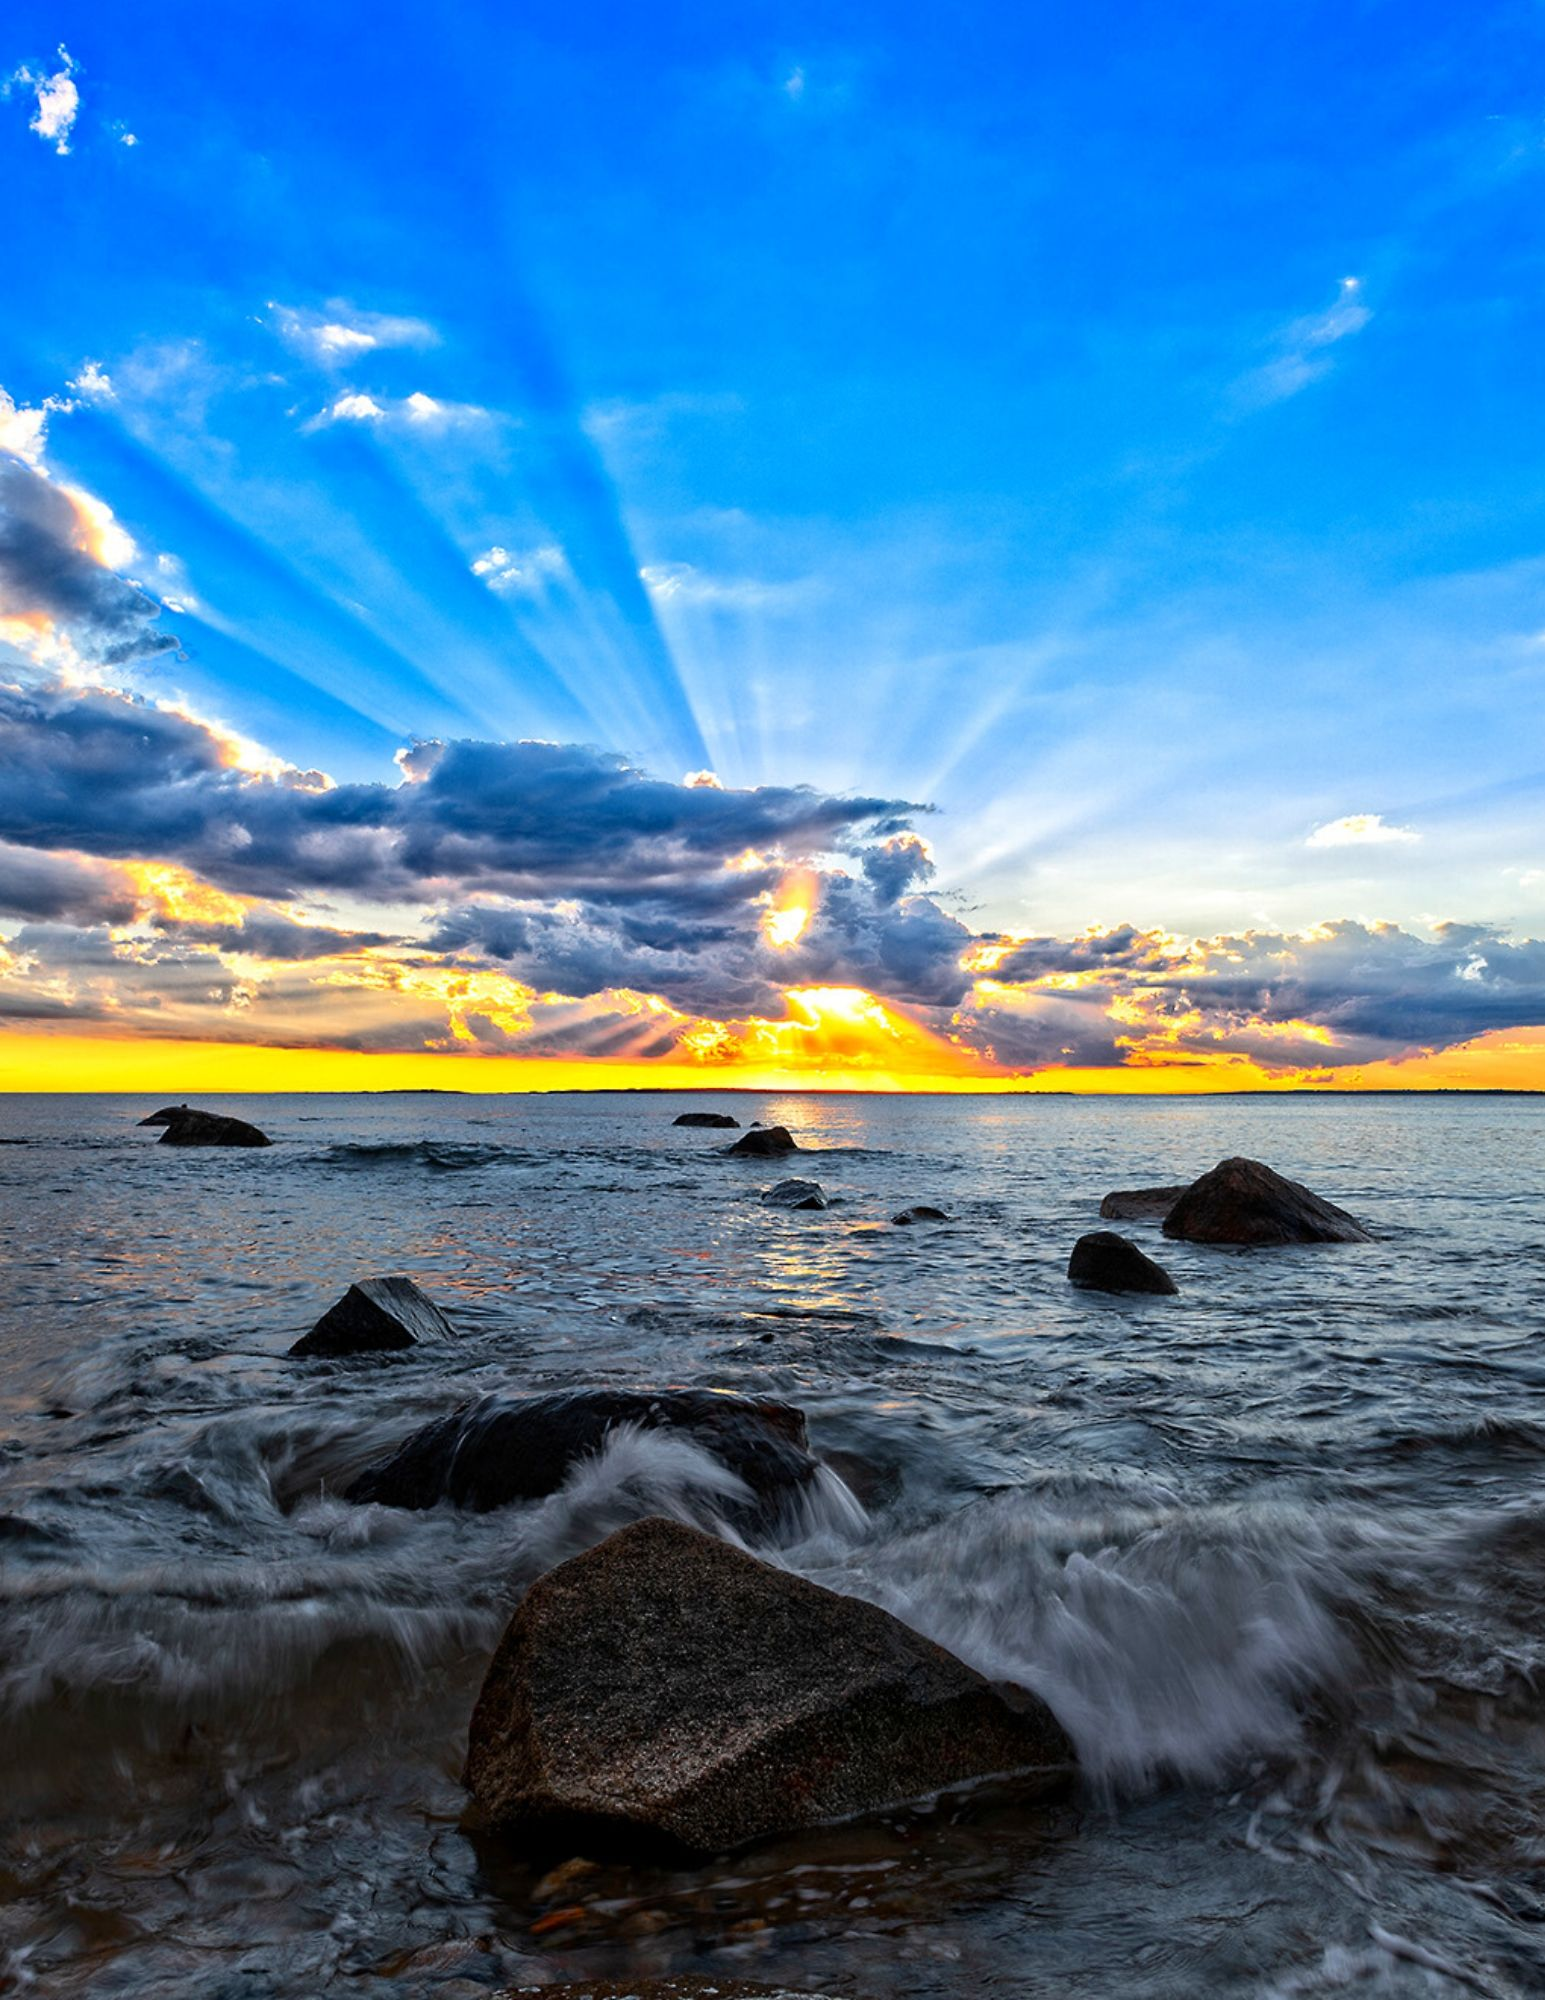 John Montes Jr Photography Best Places to Photograph Sunrise and Sunset on Marthas Vineyard-Best Places to Photograph Sunrise and Sunset on Marthas Vineyard-20